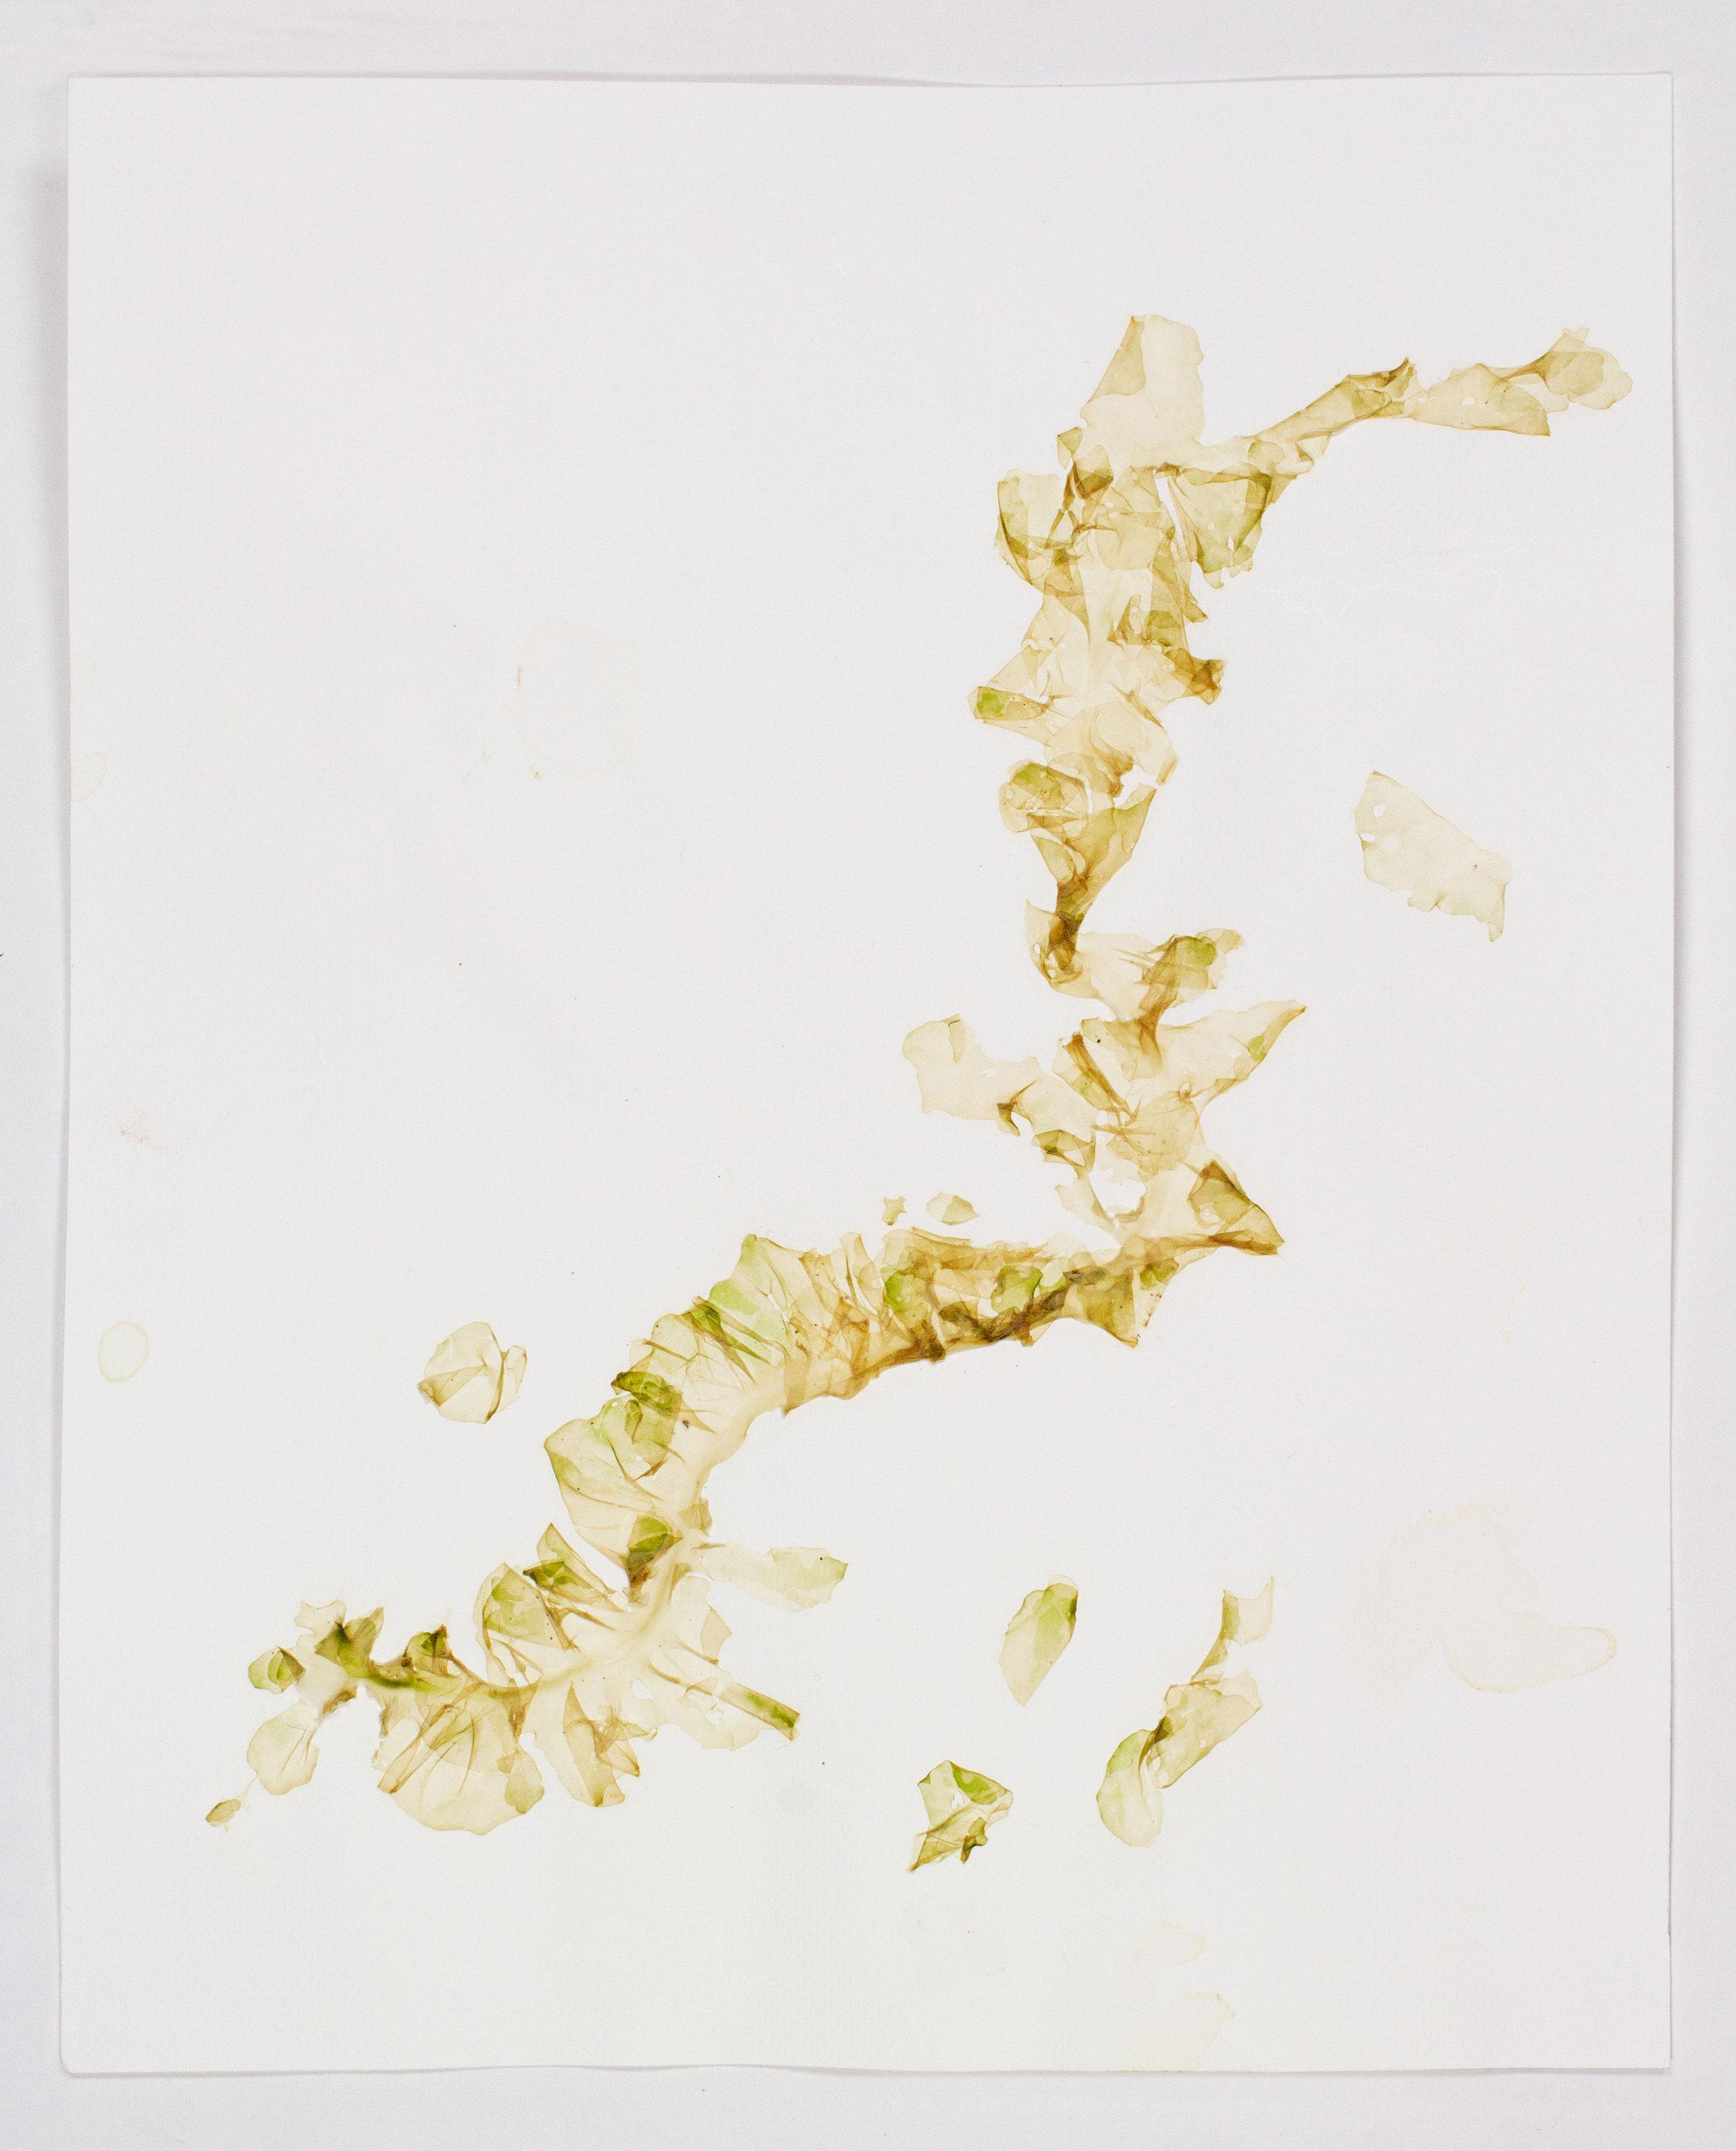 SeaweedCollage-Placenta.jpg